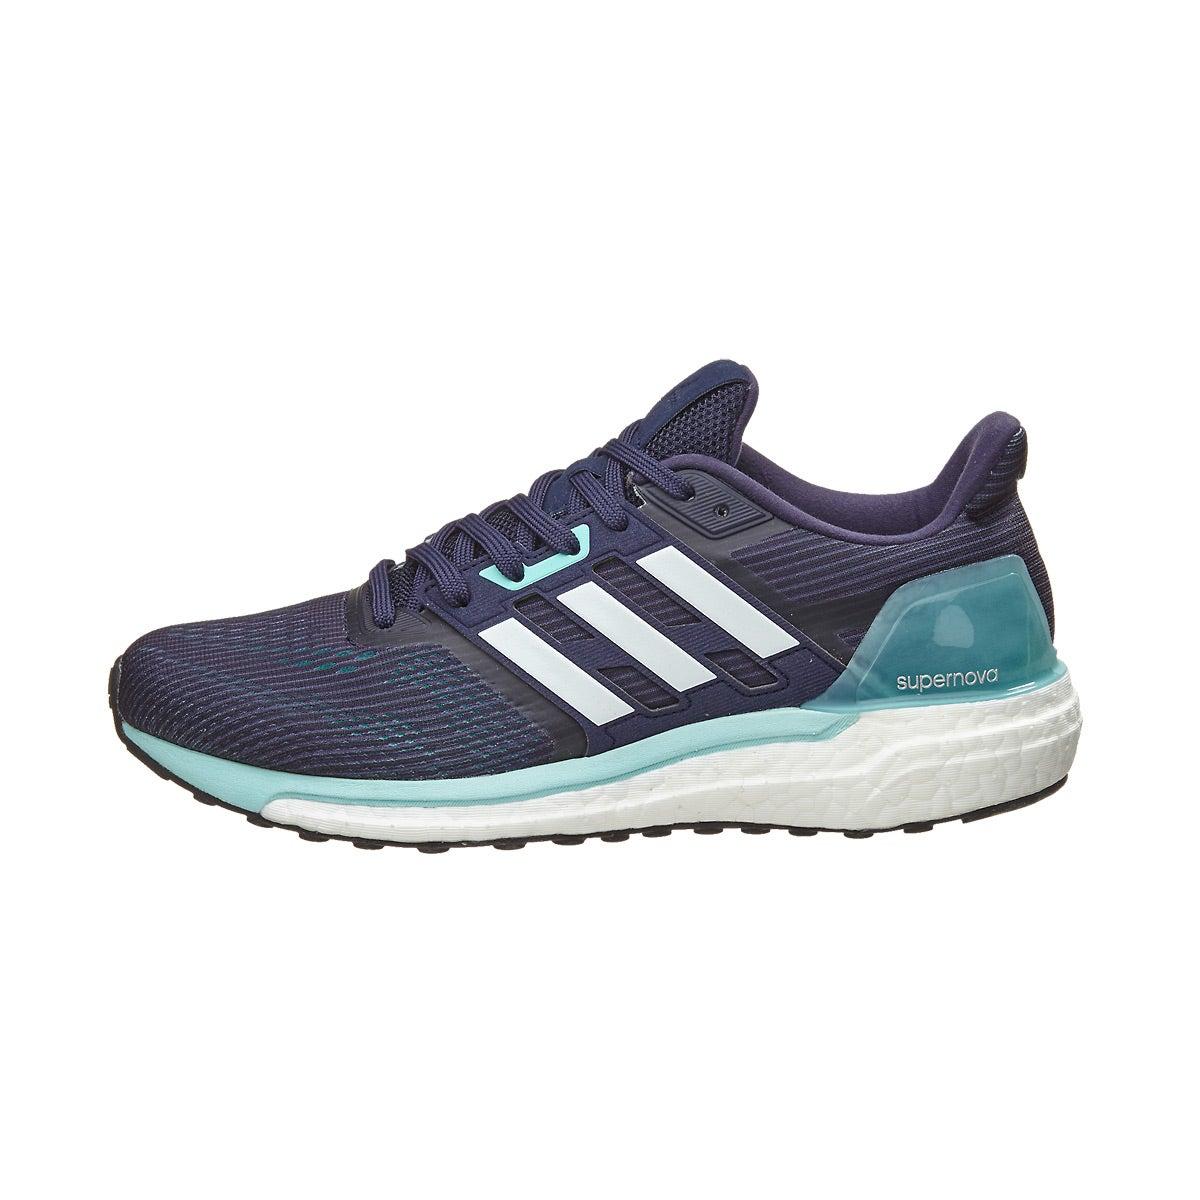 Adidas Women S Supernova Shoes